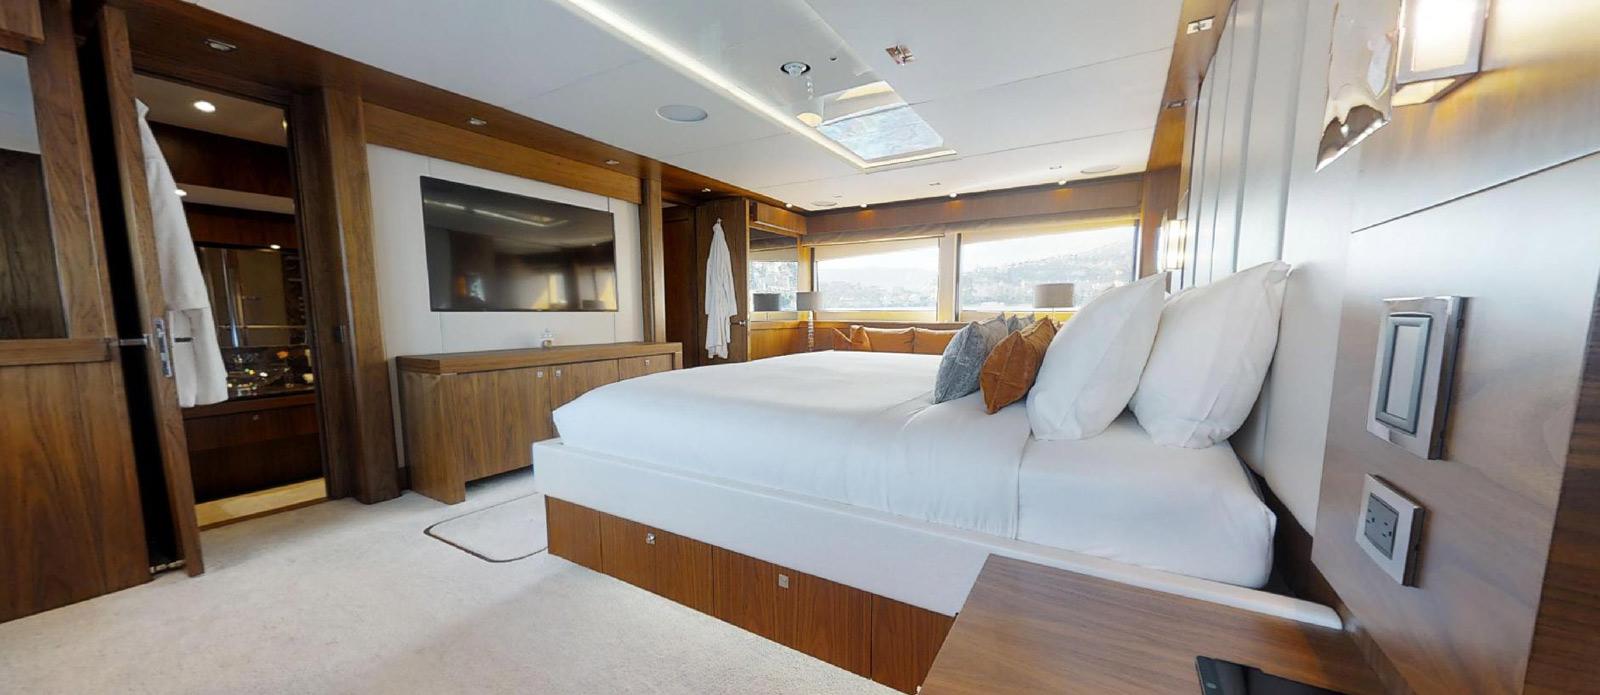 Sunseeker-115-Sport-Yacht-Zulu-Master-Cabin-6